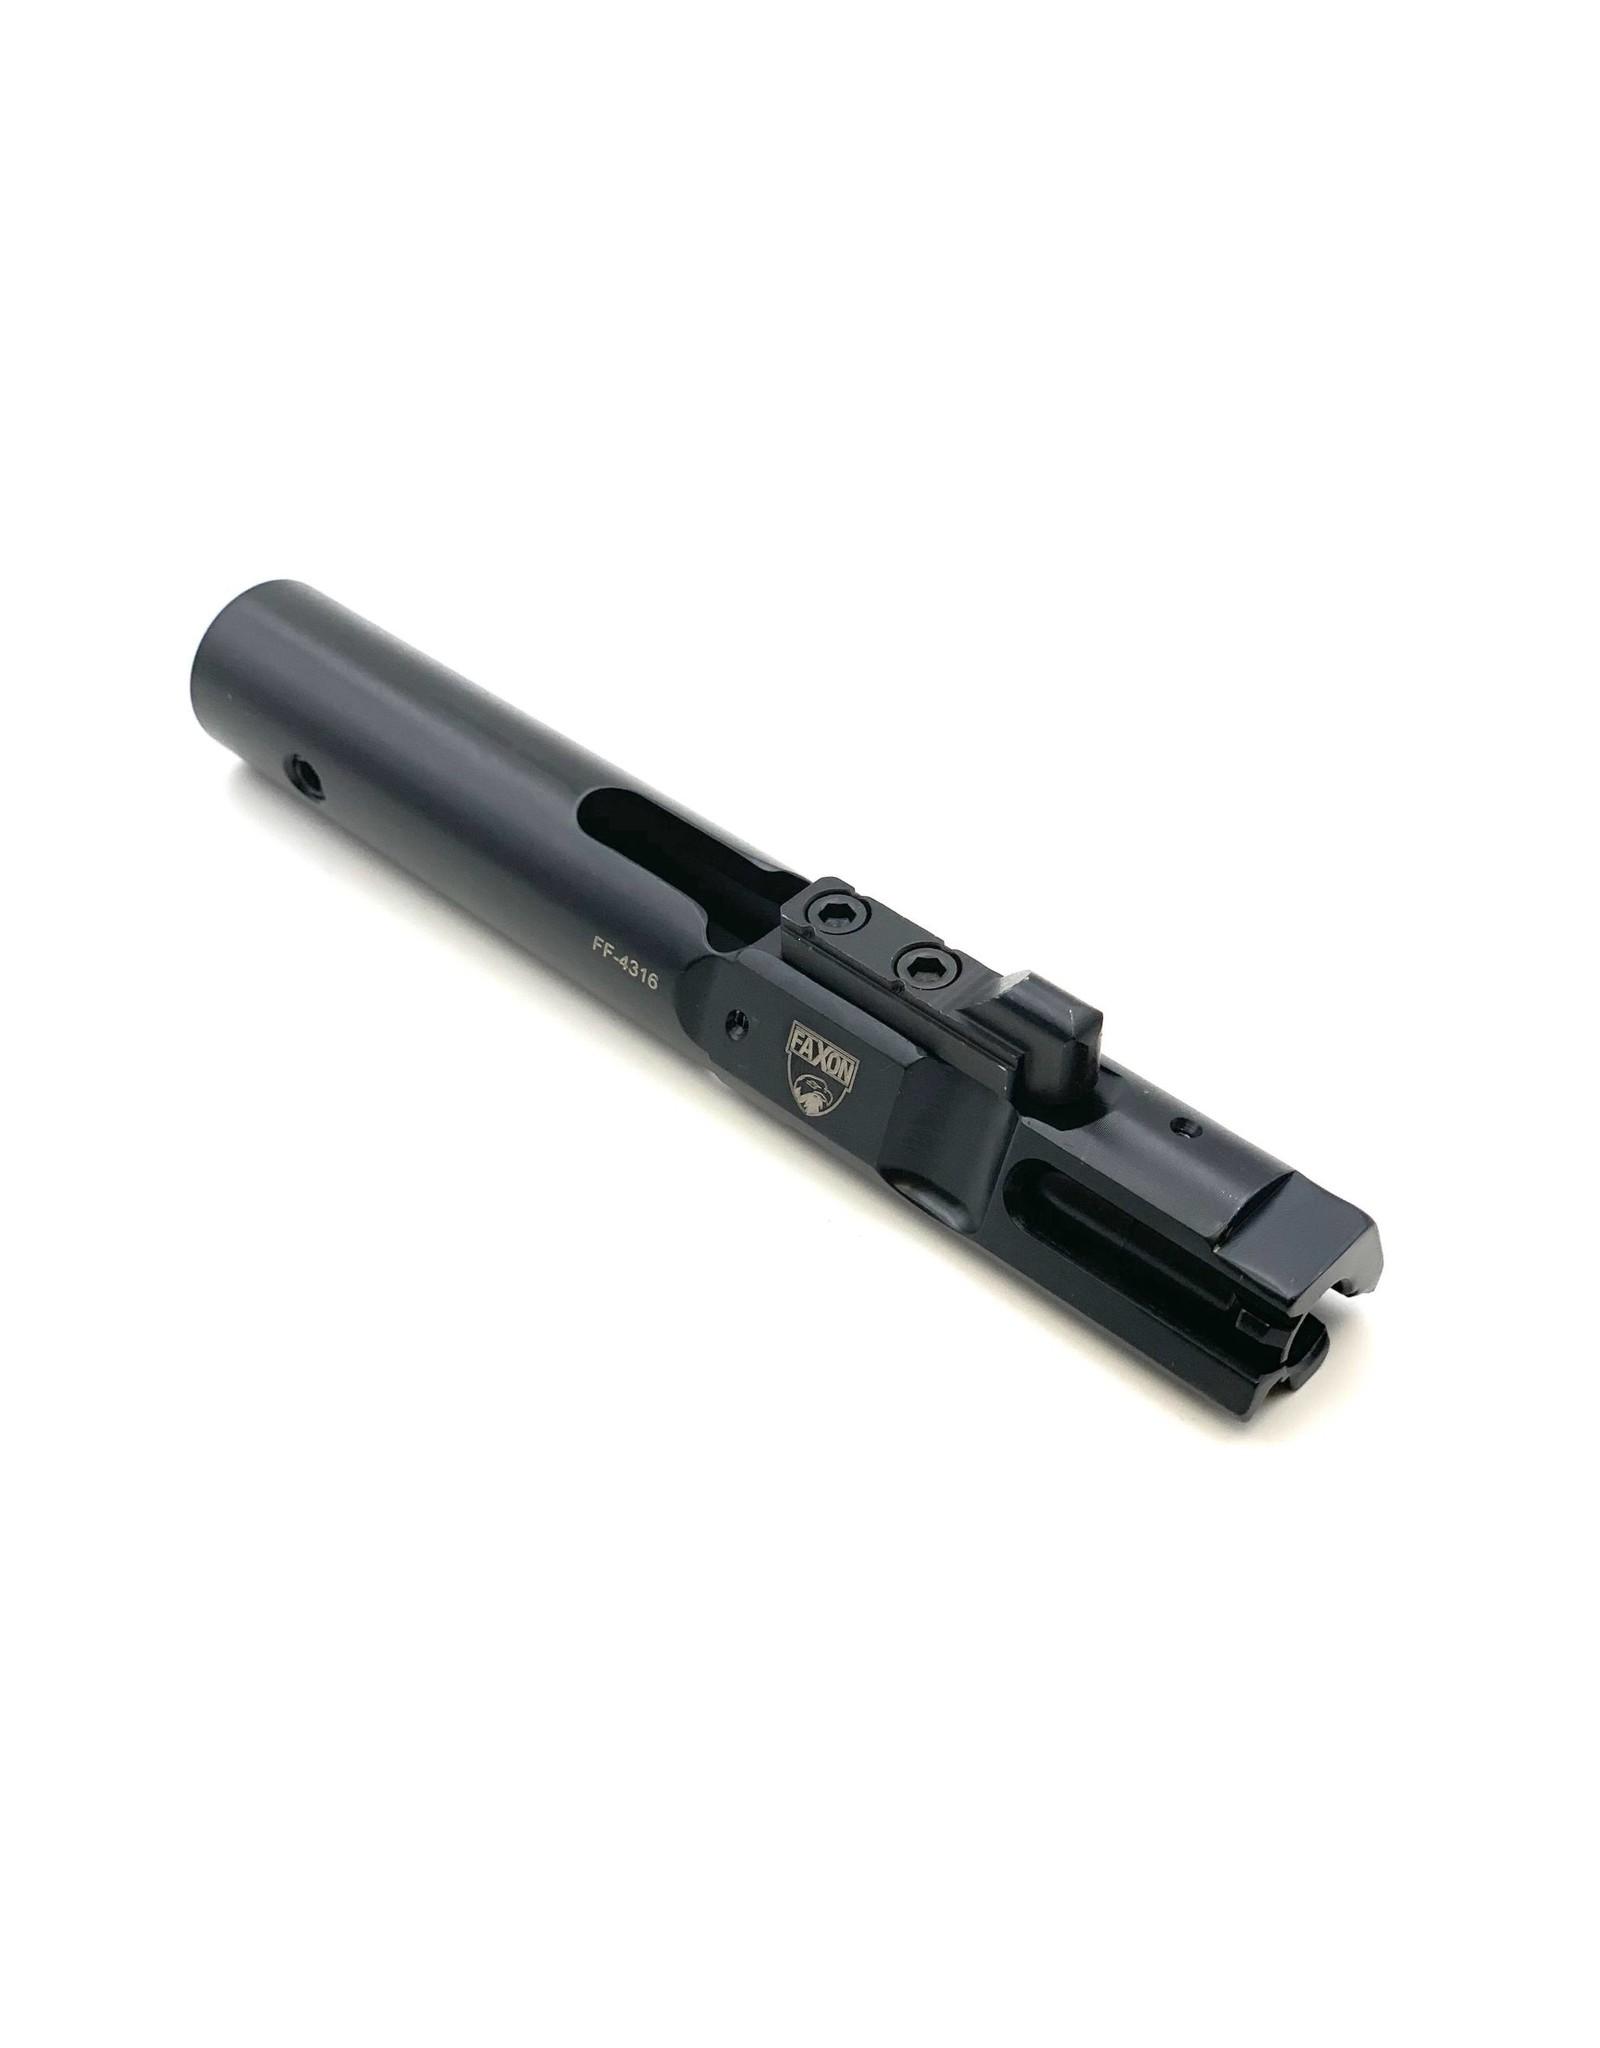 Faxon Faxon 9mm Bolt Carrier Group (BCG) - Nitride